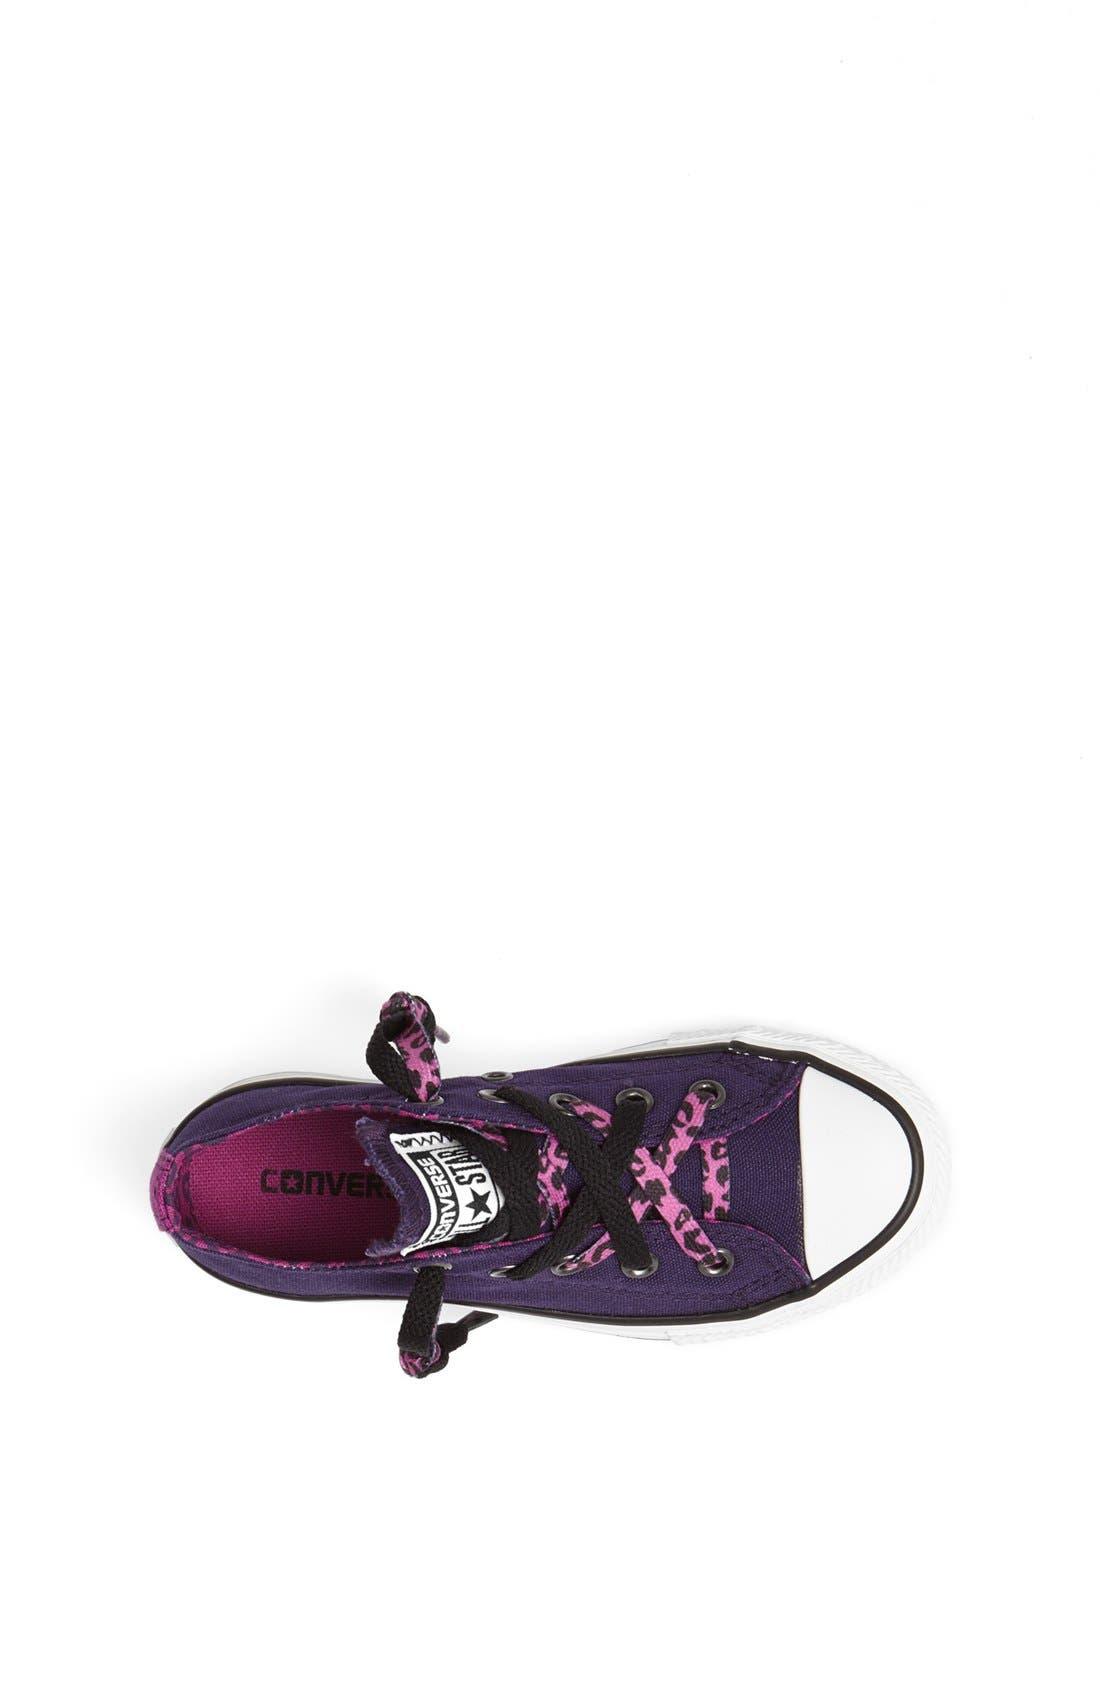 Alternate Image 3  - Converse Chuck Taylor® All Star® 'Kriss N Kross' Sneaker (Toddler, Little Kid & Big Kid)